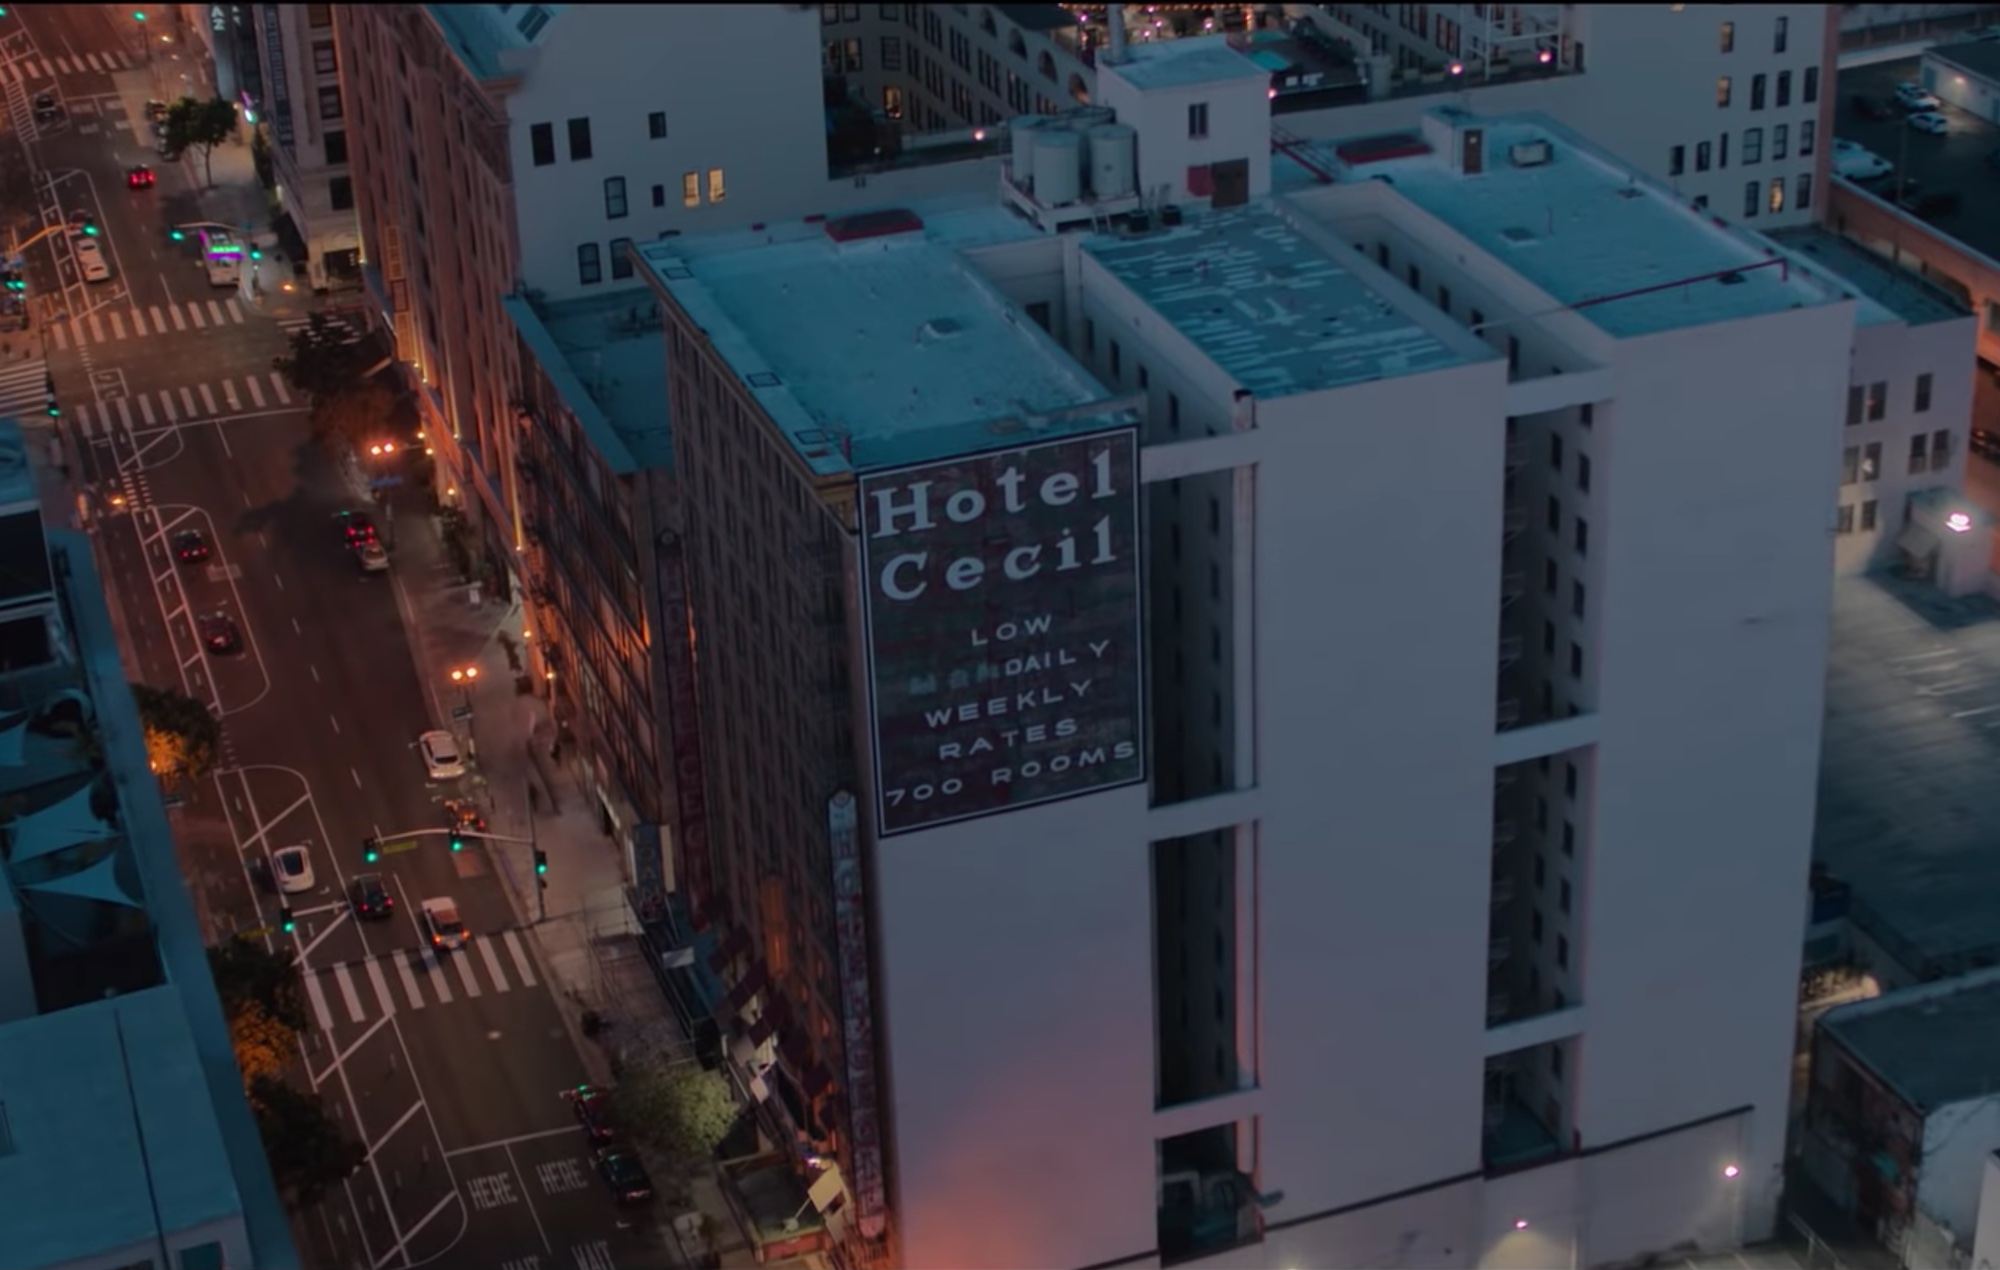 New Netflix doc investigates hotel that inspired 'American Horror Story'